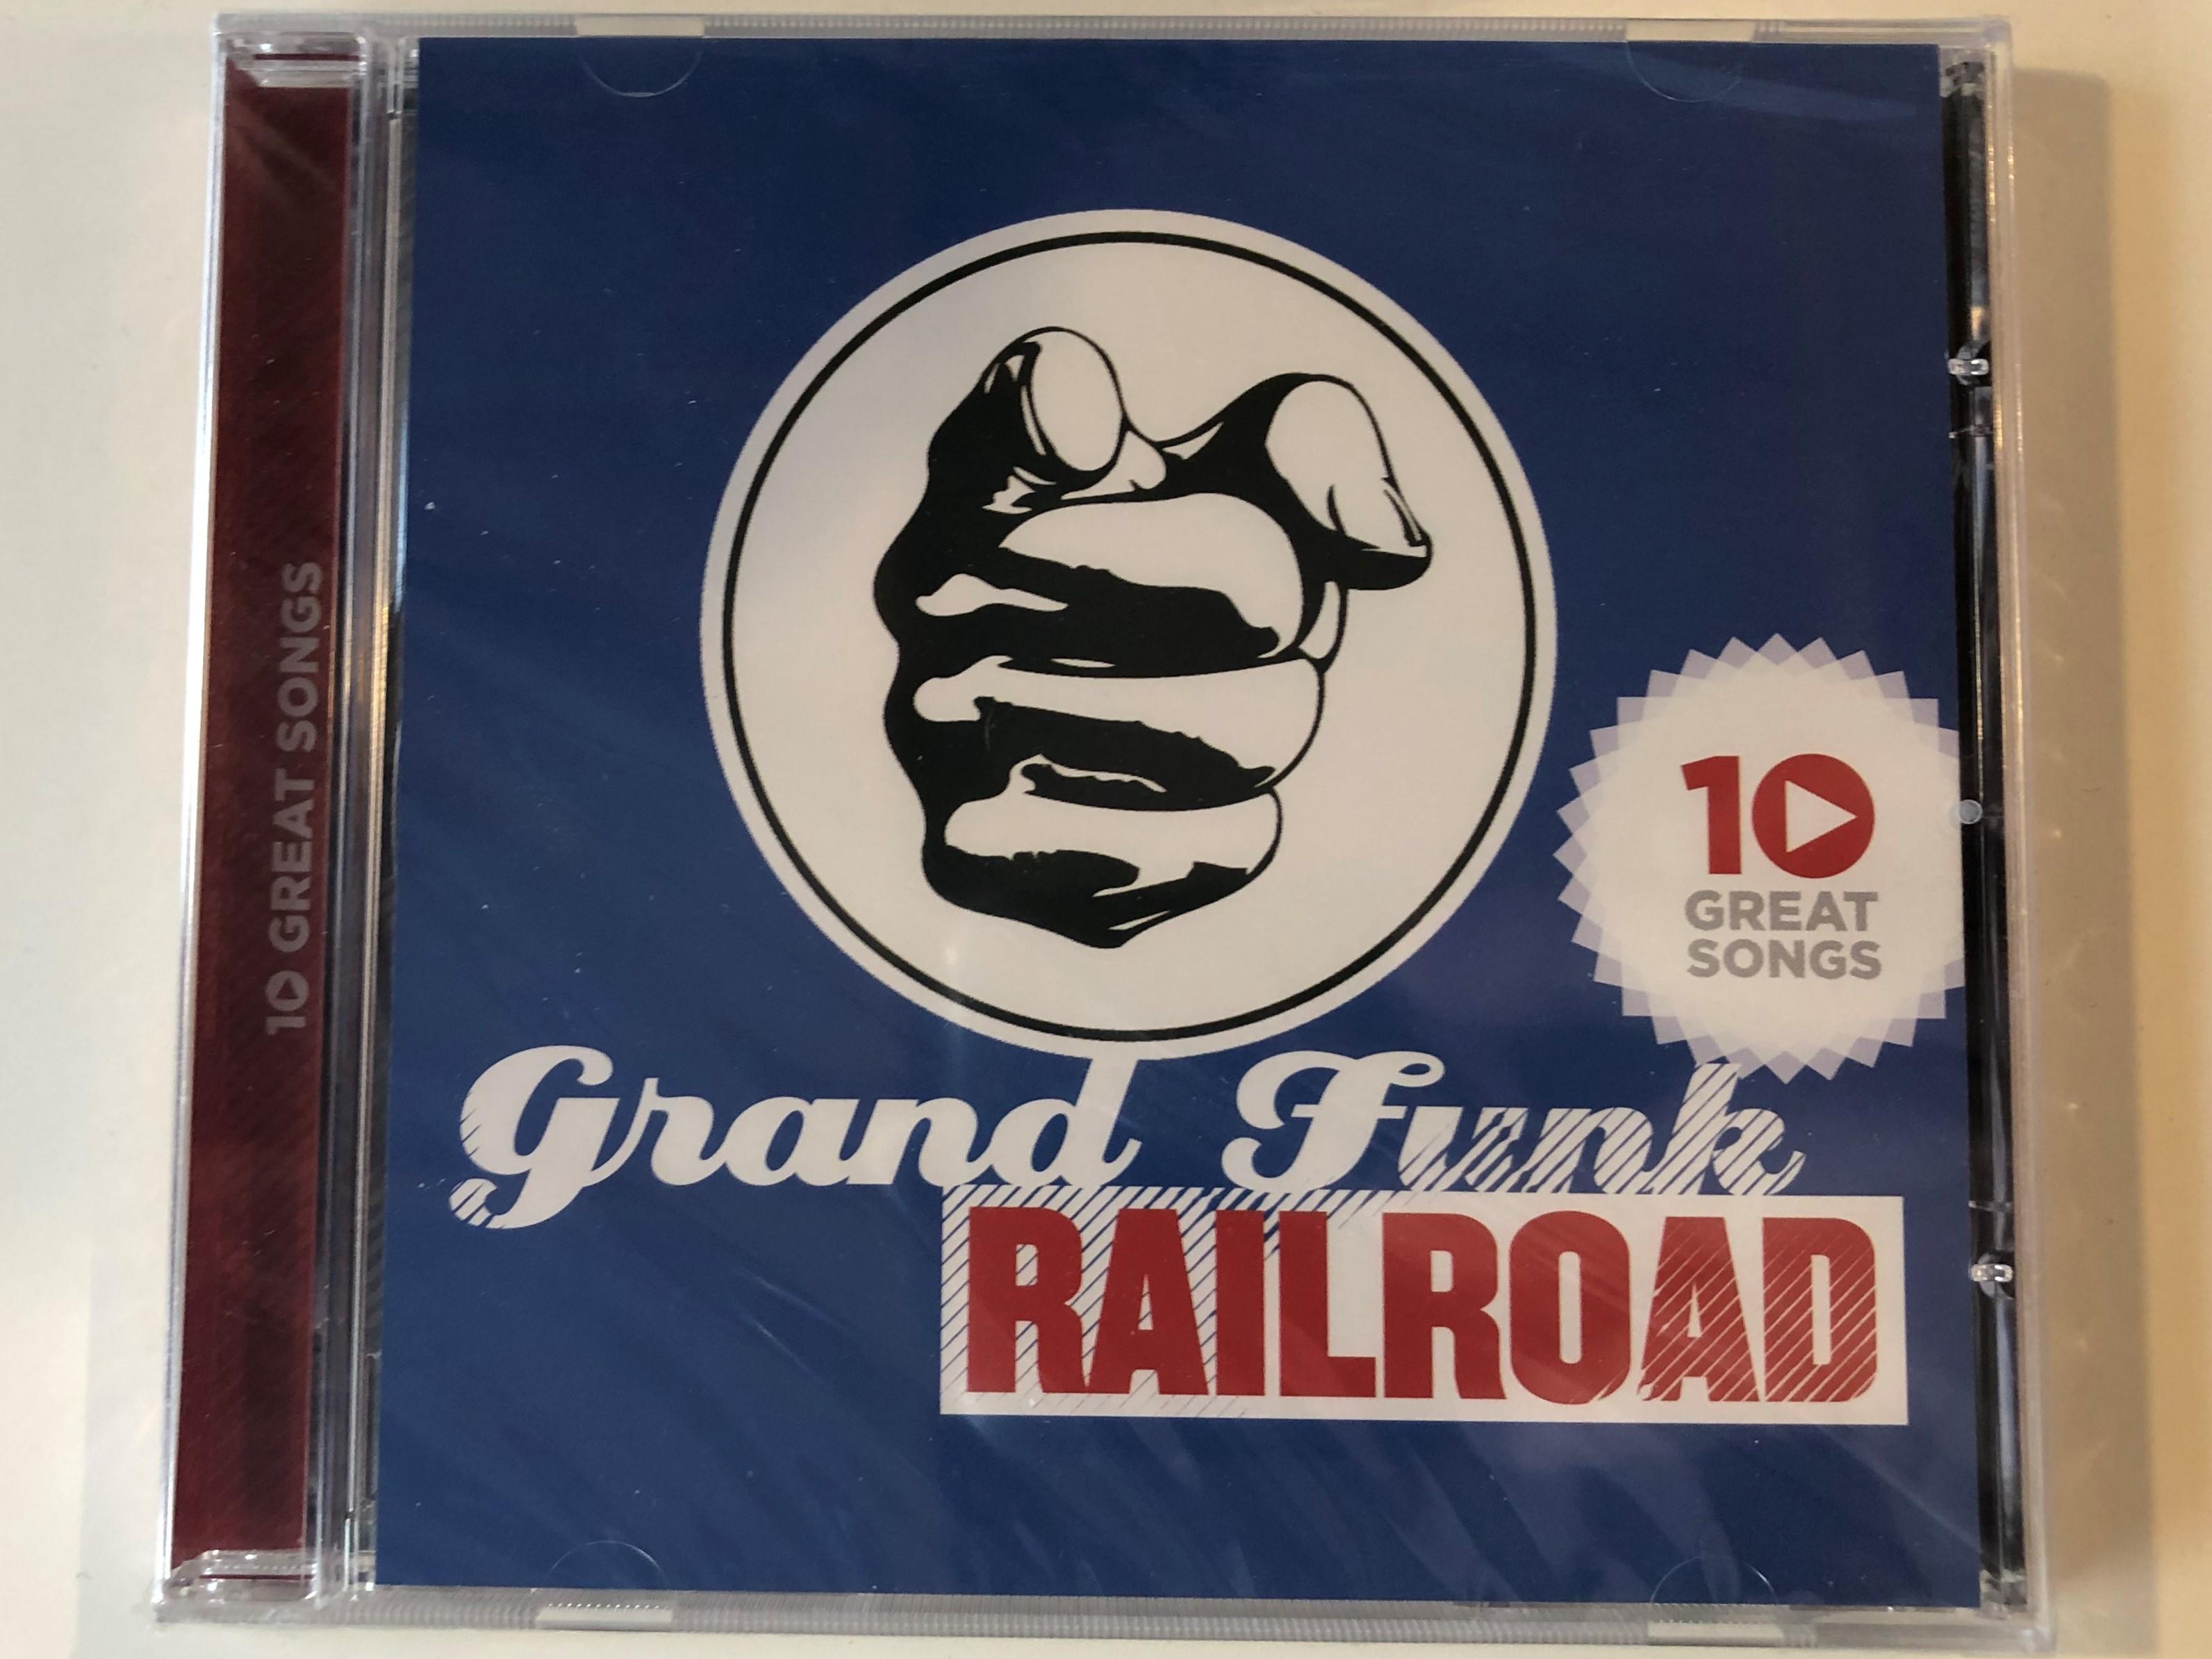 grand-funk-railroad-10-great-songs-capitol-records-audio-cd-2011-5099908325129-1-.jpg